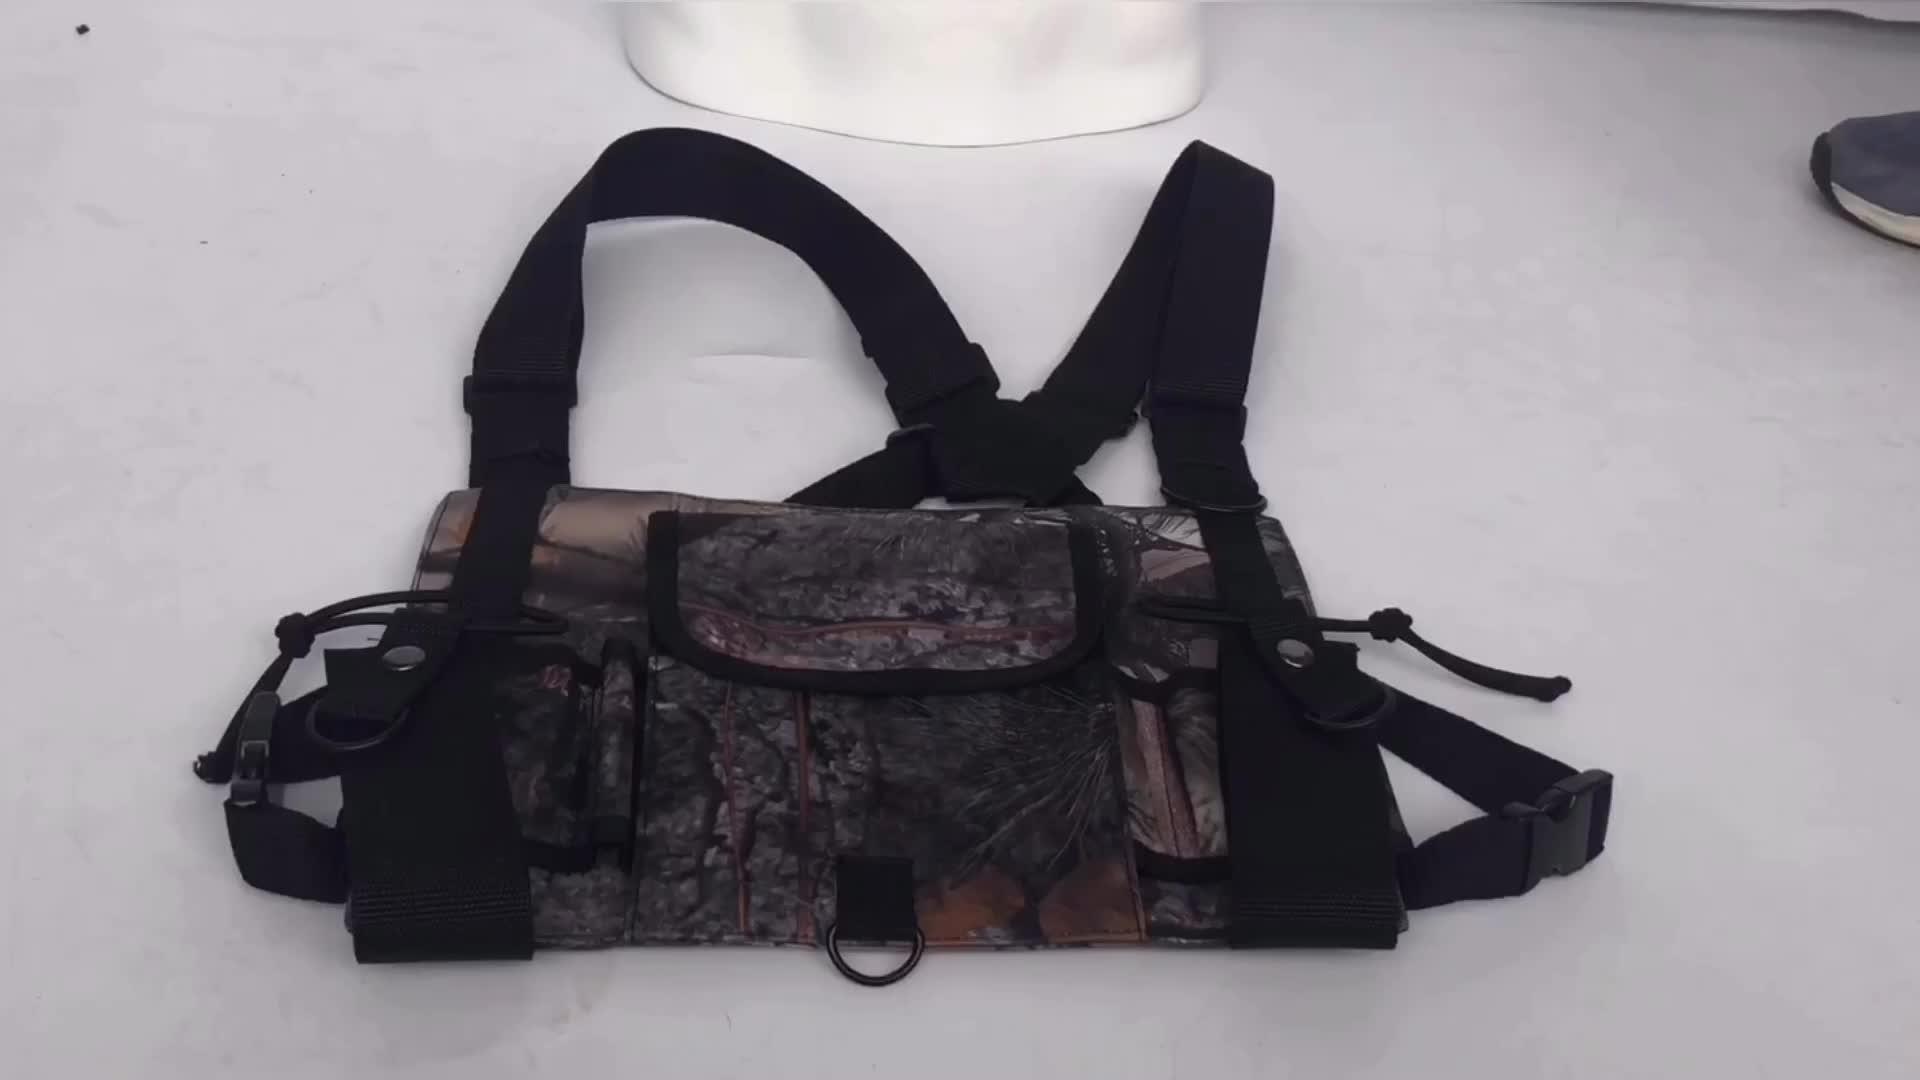 Camouflage Universal Radio Harness Vest with Adjustable Shoulder Chest